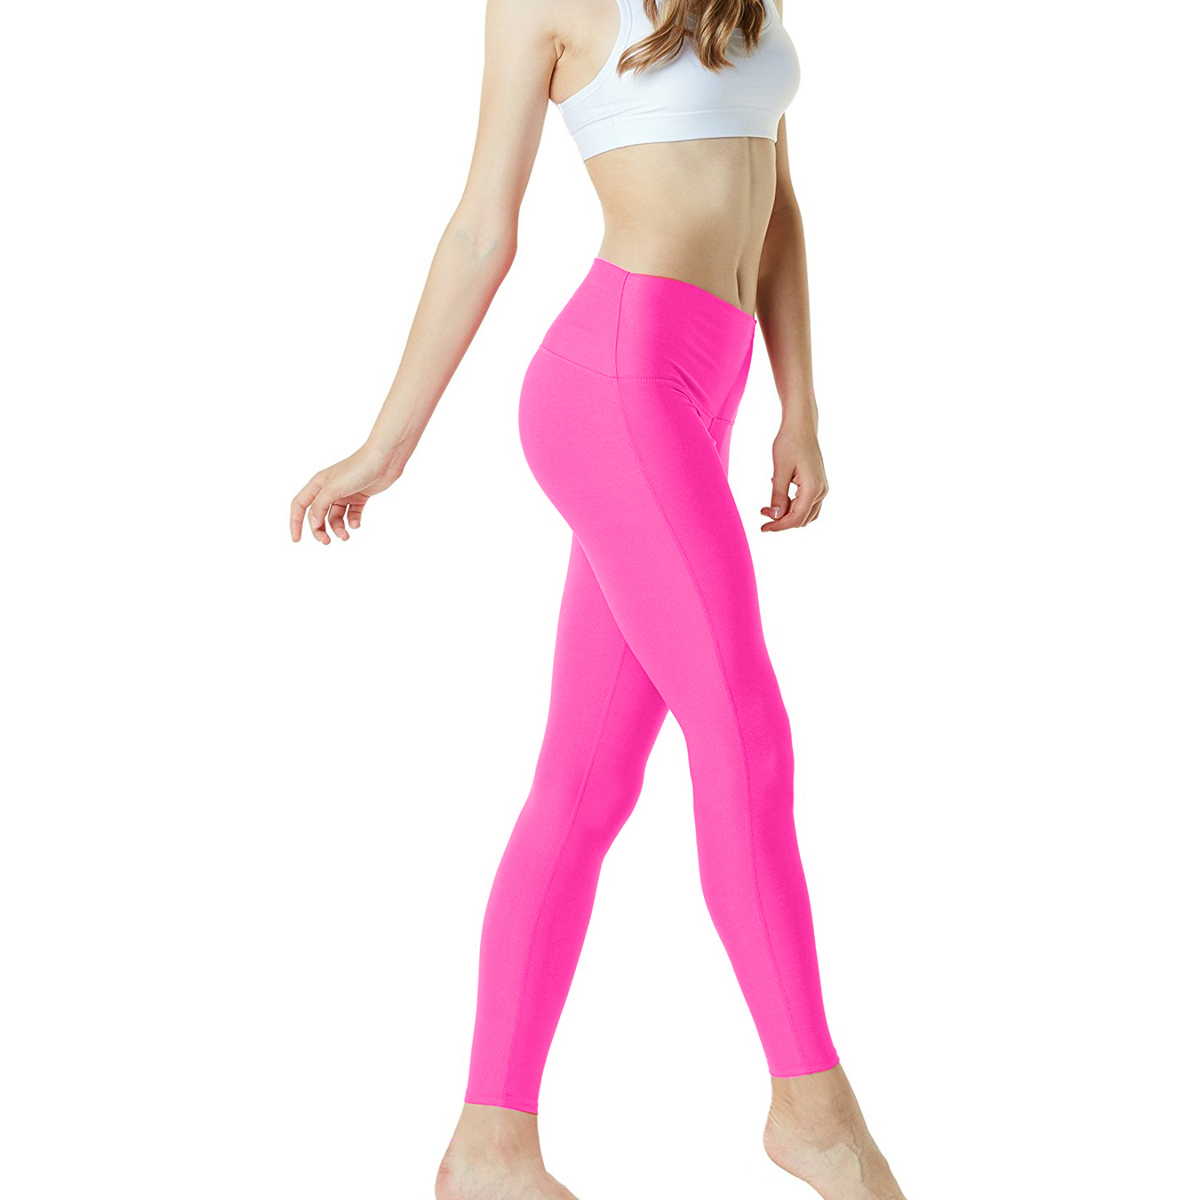 thumbnail 52 - TSLA Tesla FYP42 Women's High-Waisted Ultra-Stretch Tummy Control Yoga Pants